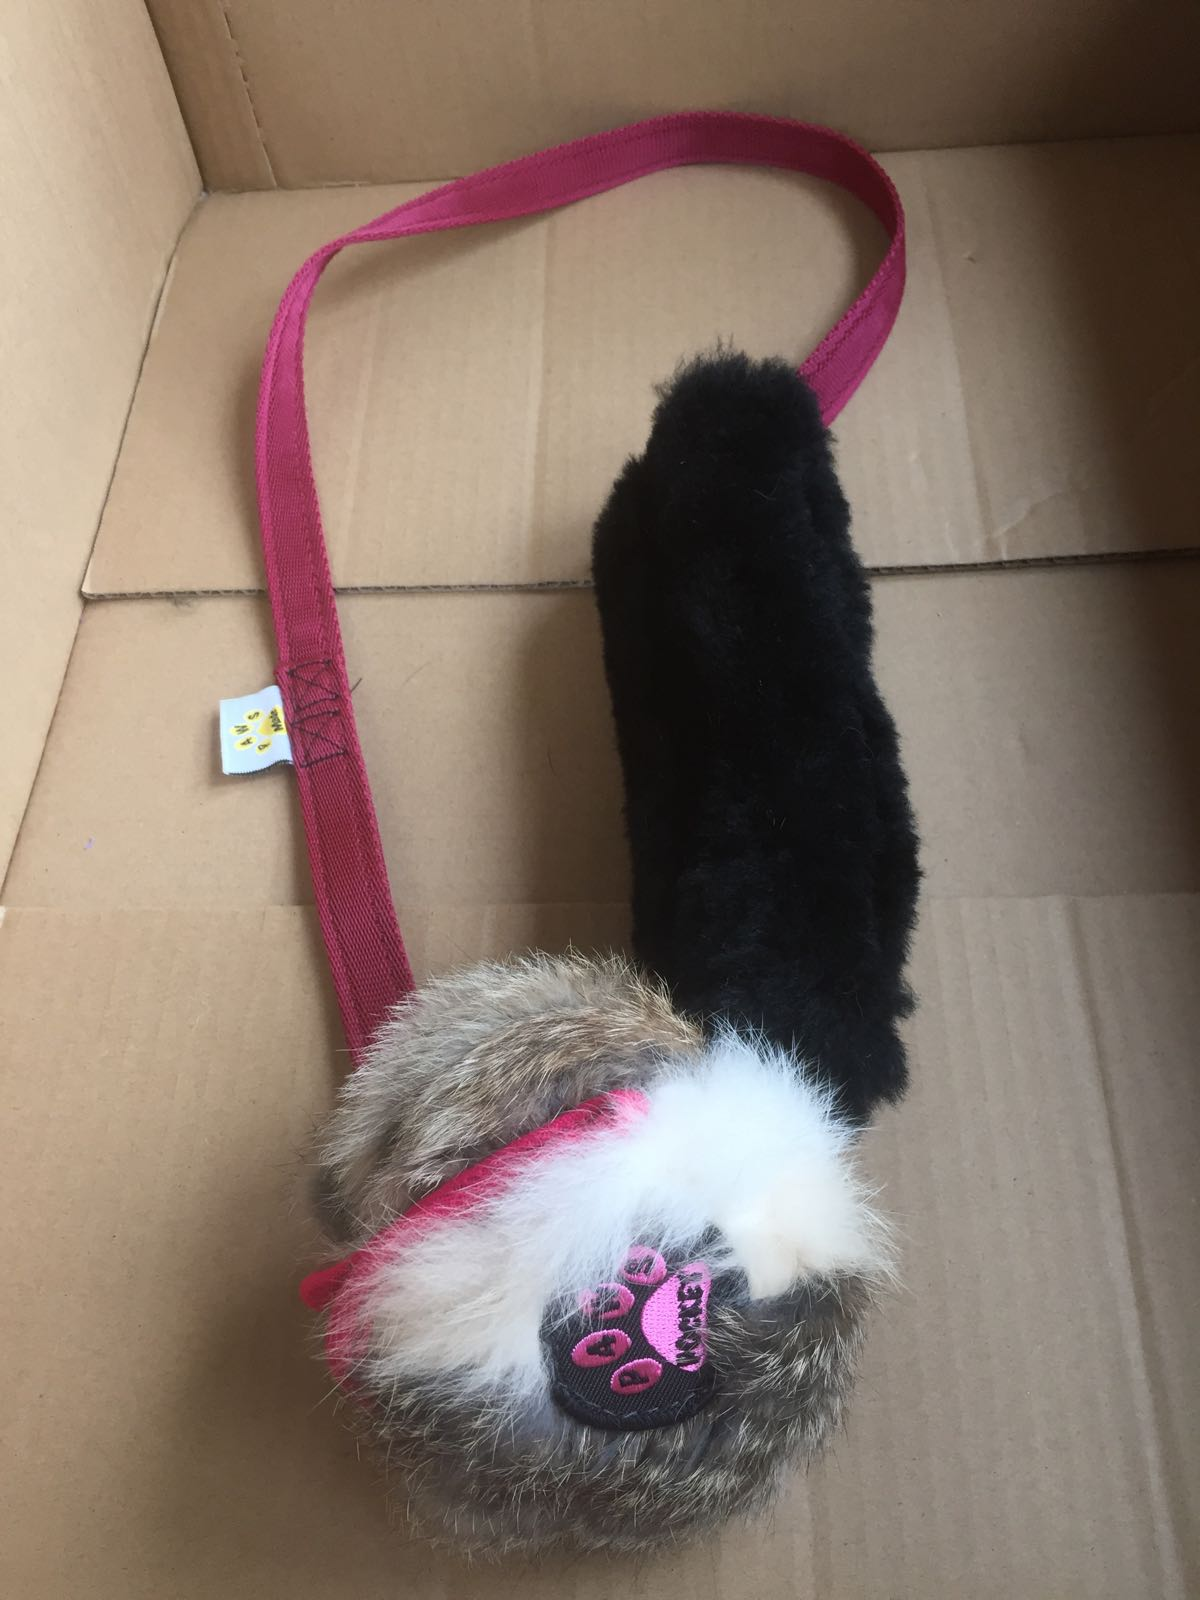 Paws Pocket Rabbit Extra Long Tug with Sheepskin